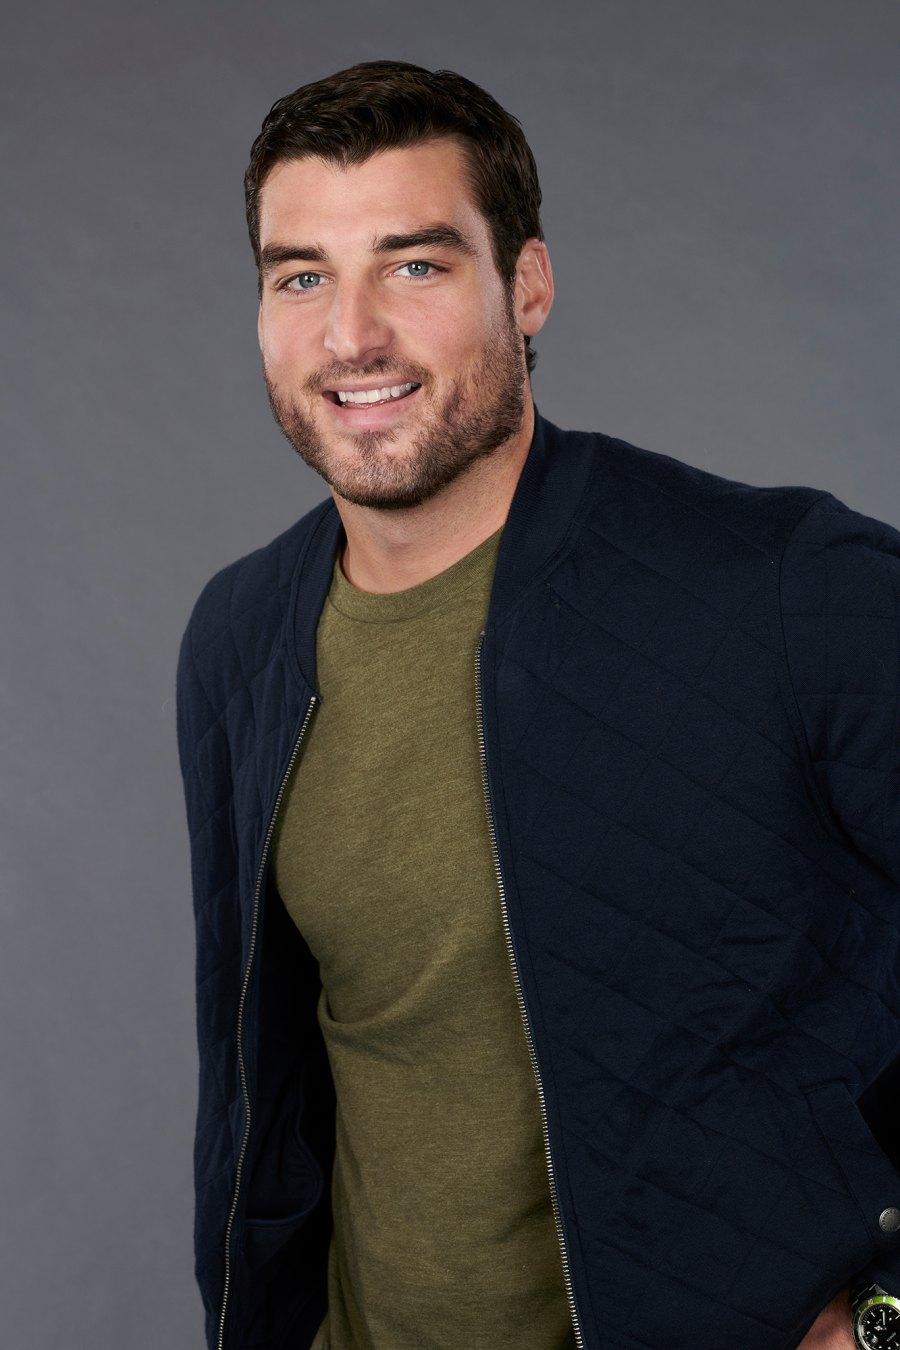 Tyler Gwozdz Bachelor Bachelorette Tragedies